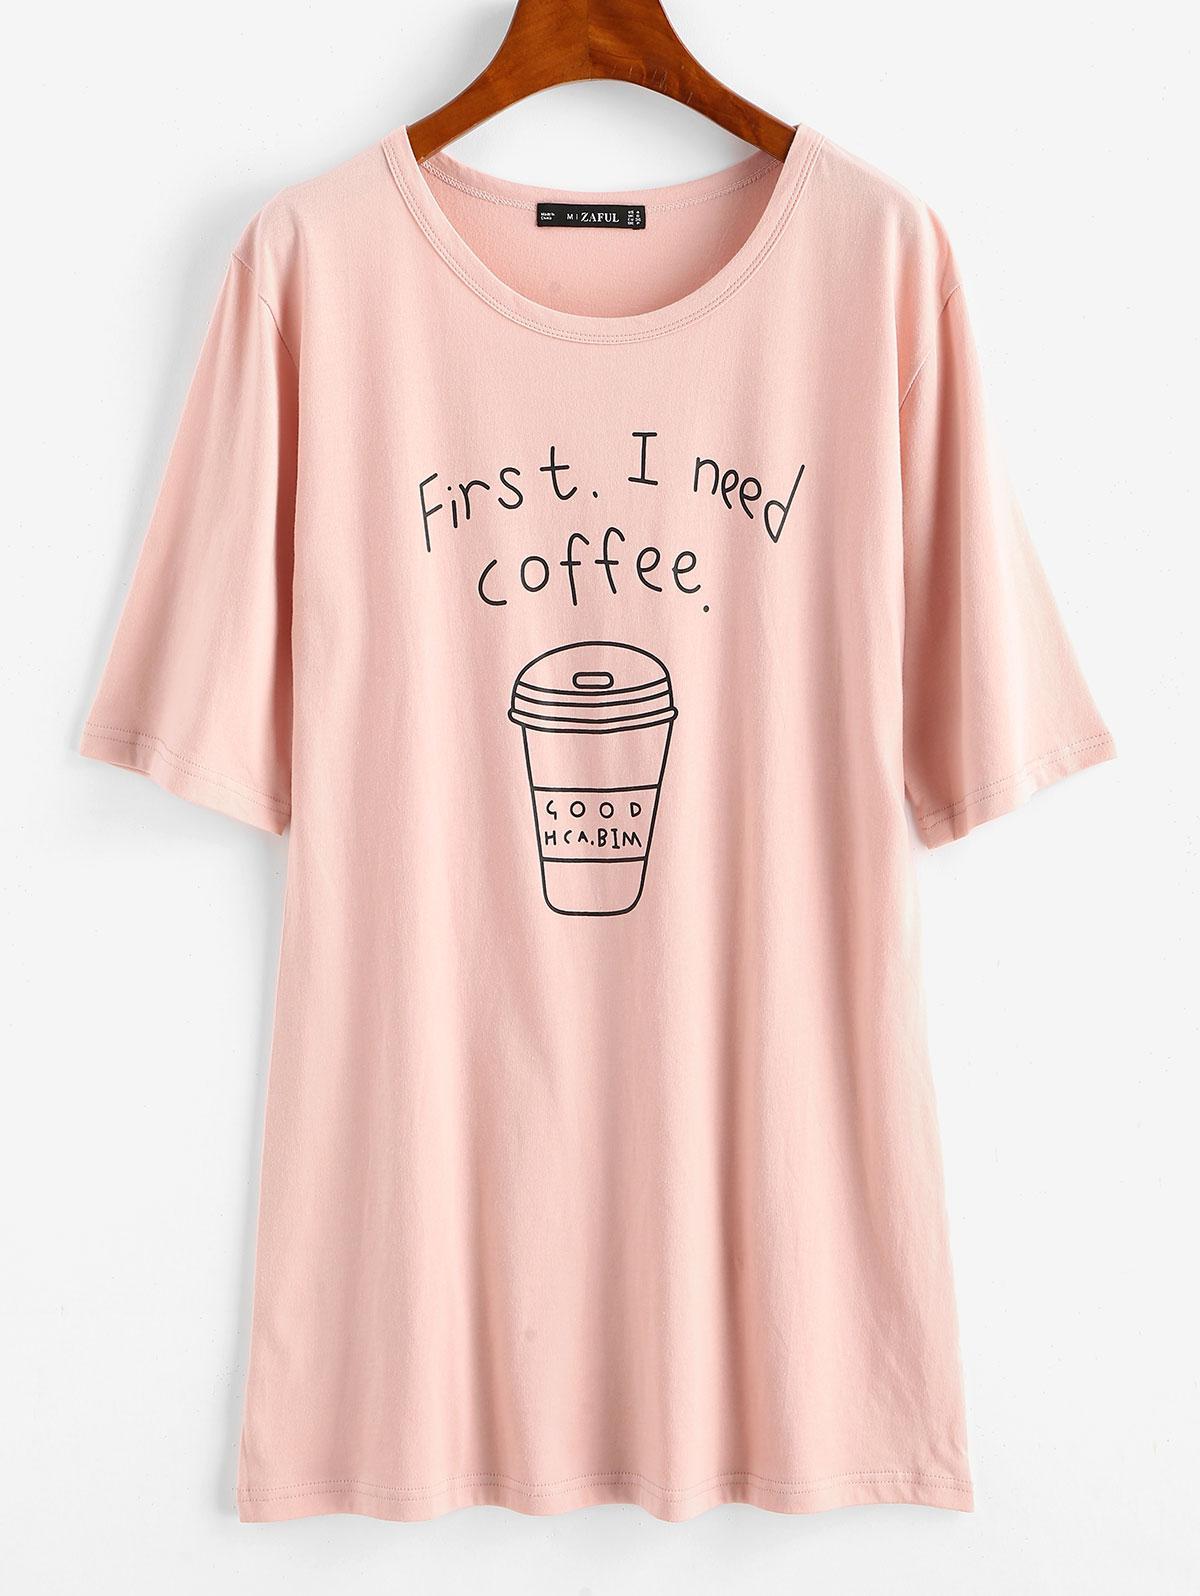 T-shirt Tunique Graphique Café - ZAFUL - Modalova